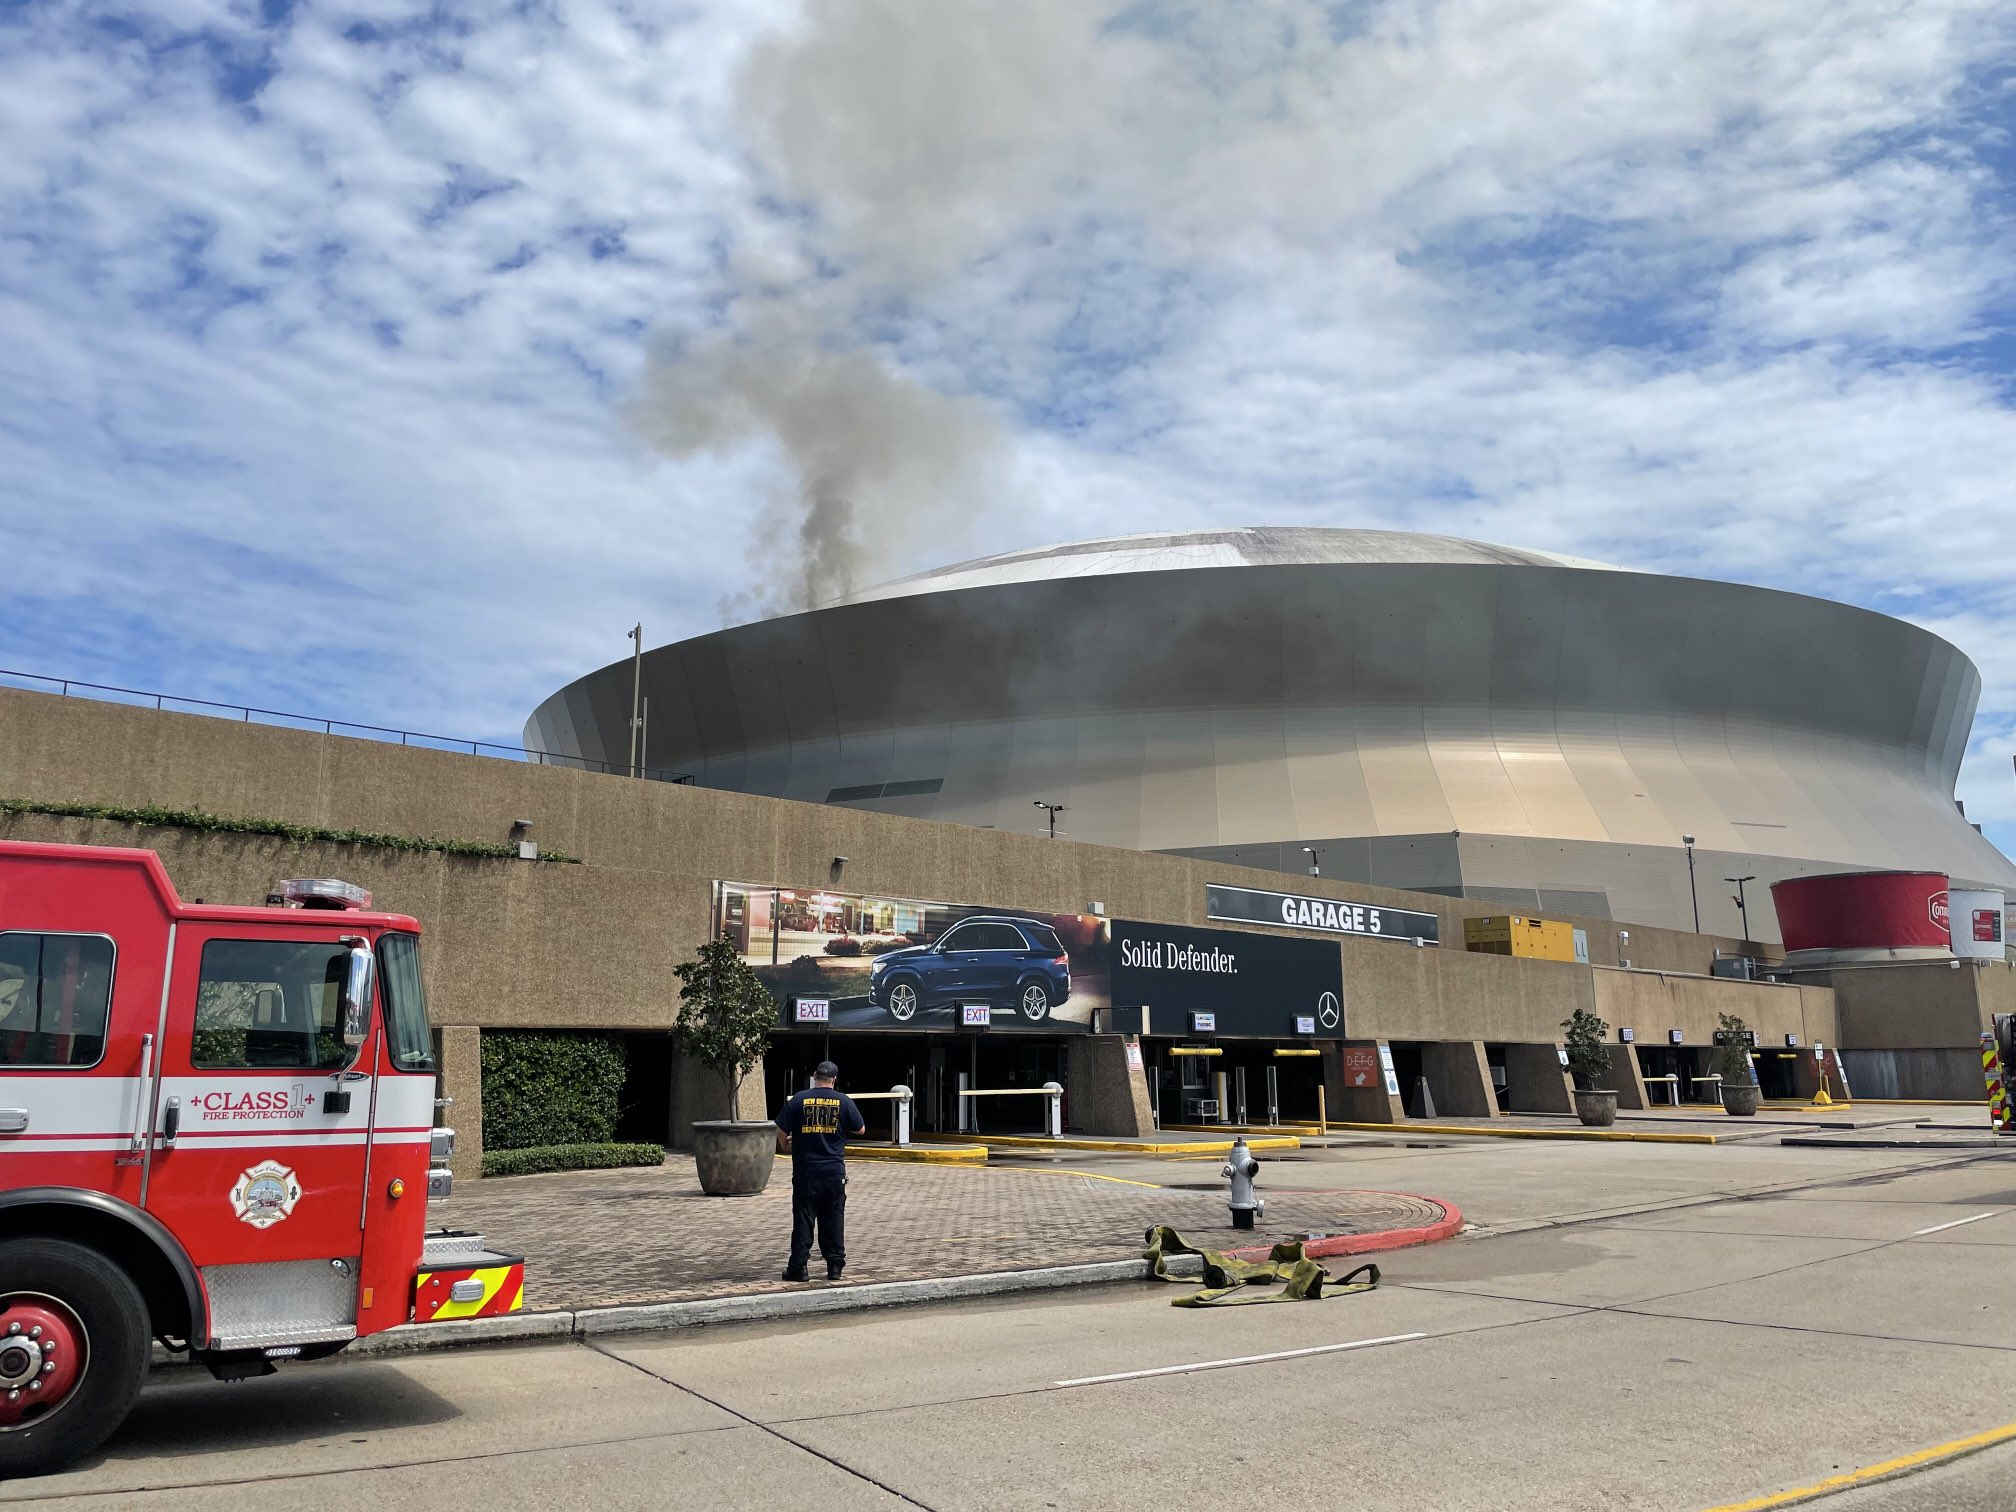 Fire, Smoke Seen on Caesars Superdome Roof Ahead of Saints' Return